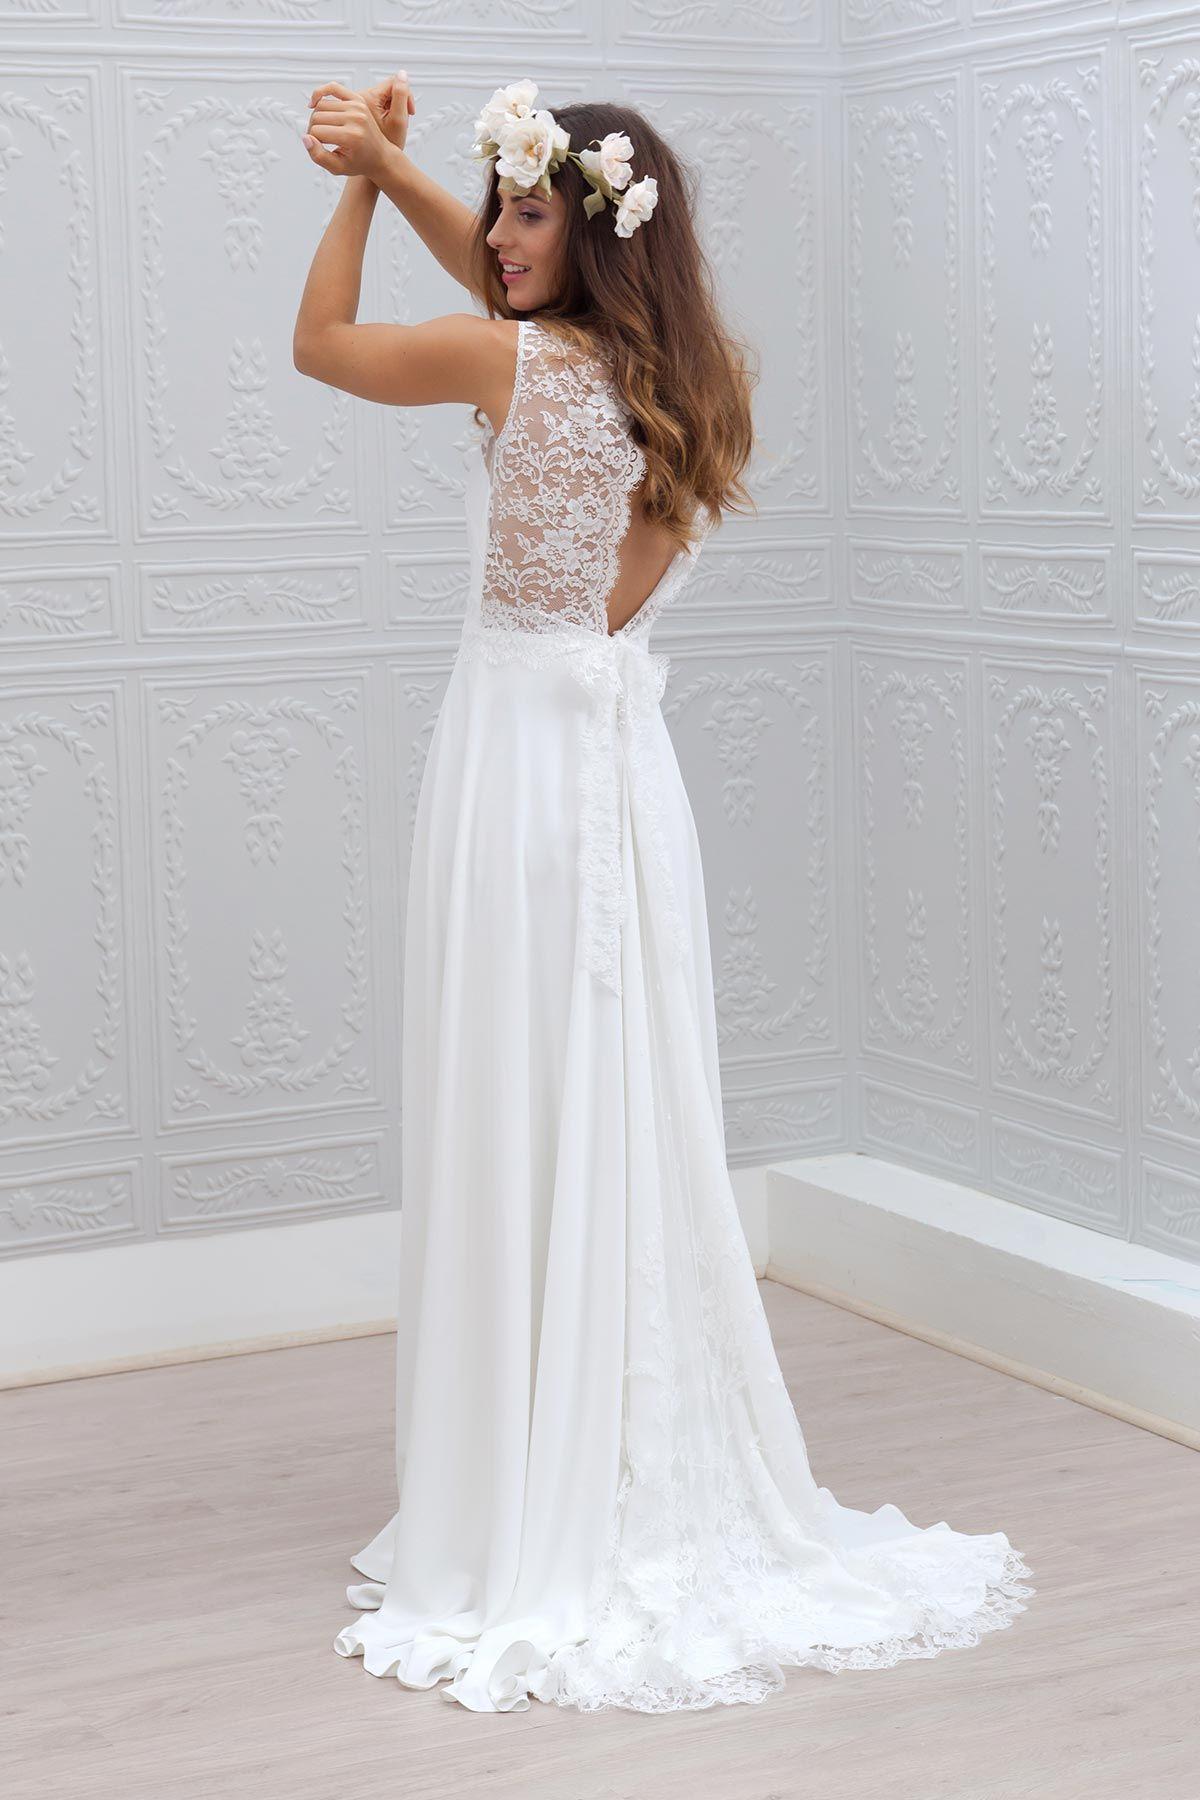 Pin by brooke petrasovits on amazing wedding dresses pinterest